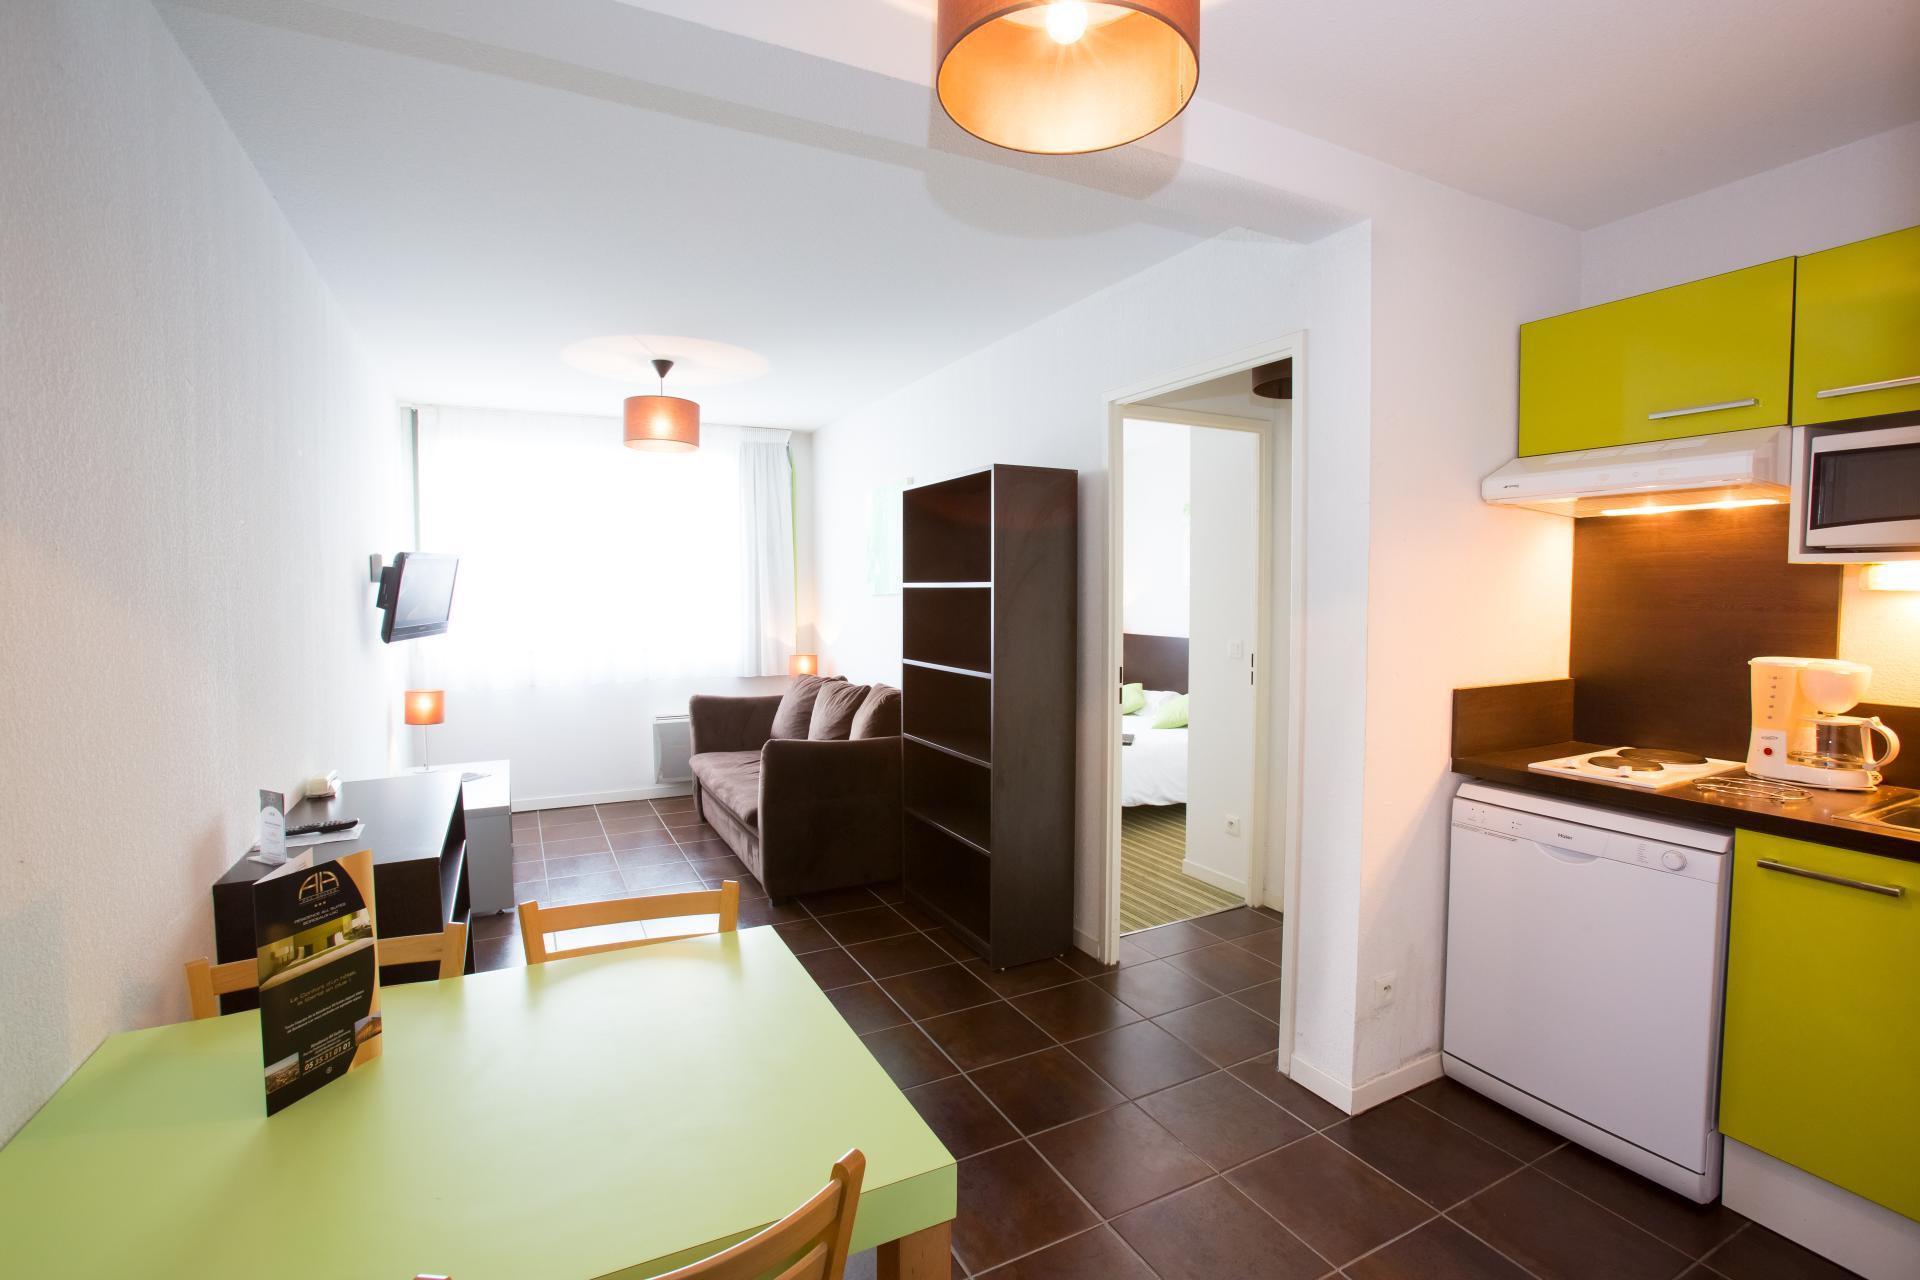 Location appartement Strasbourg : une multitude de logements